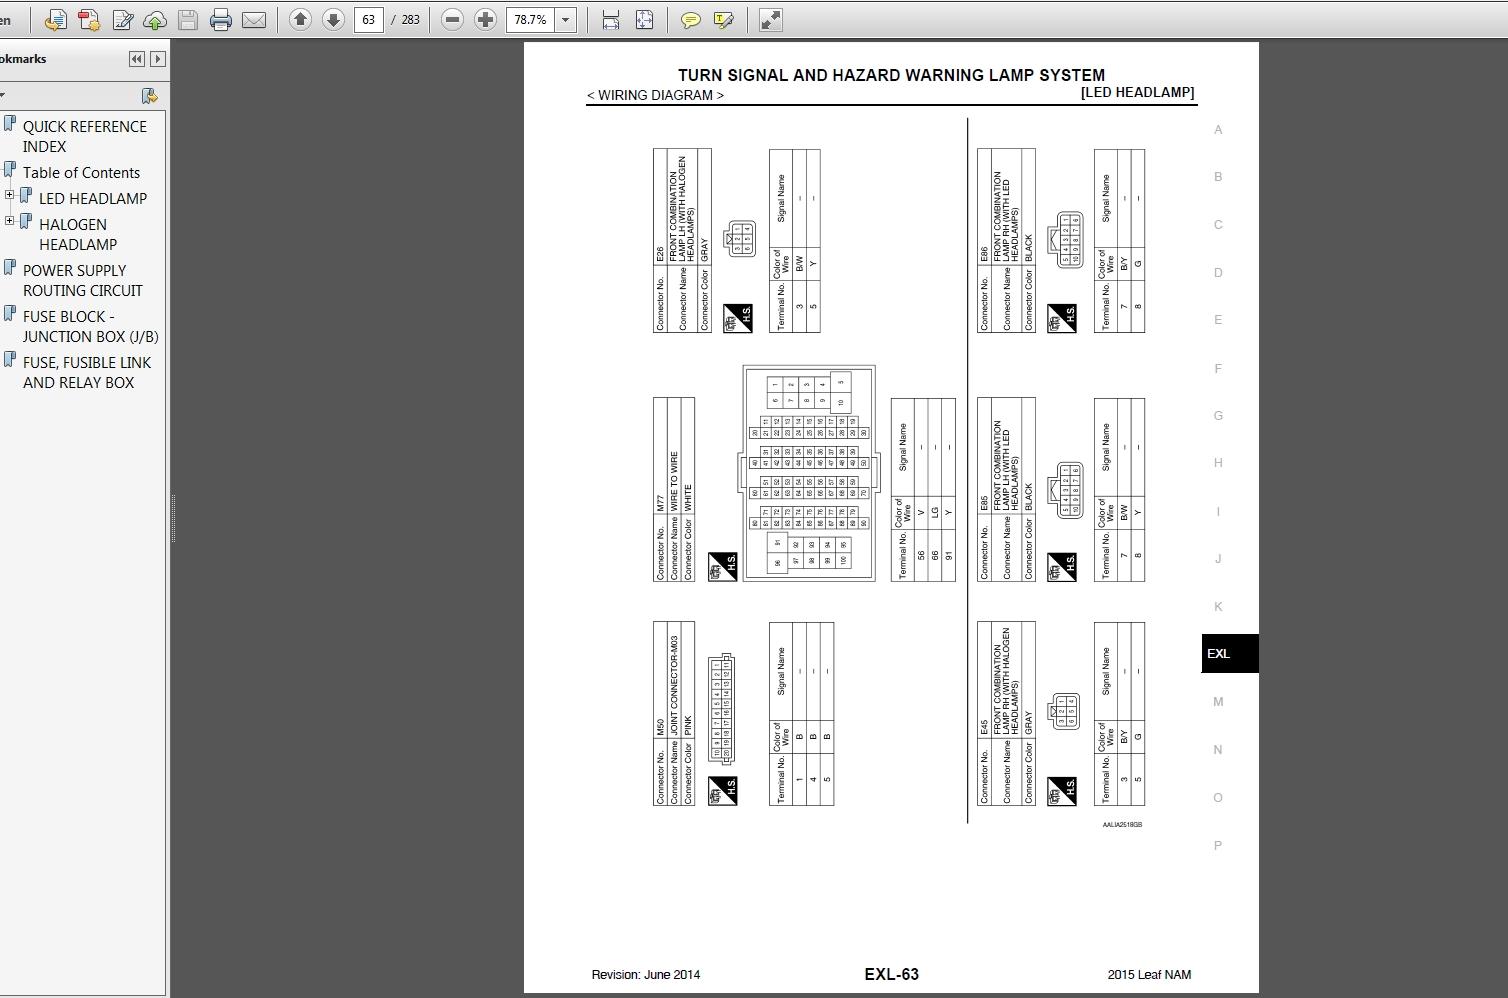 [SCHEMATICS_4HG]  NISSAN LEAF ZE0 Series SM15EA0ZE0U0 2015 Service Manual | Auto Repair Manual  Forum - Heavy Equipment Forums - Download Repair & Workshop Manual | 2015 Nissan Leaf Wiring Diagram |  | Auto Repair Manual Forum